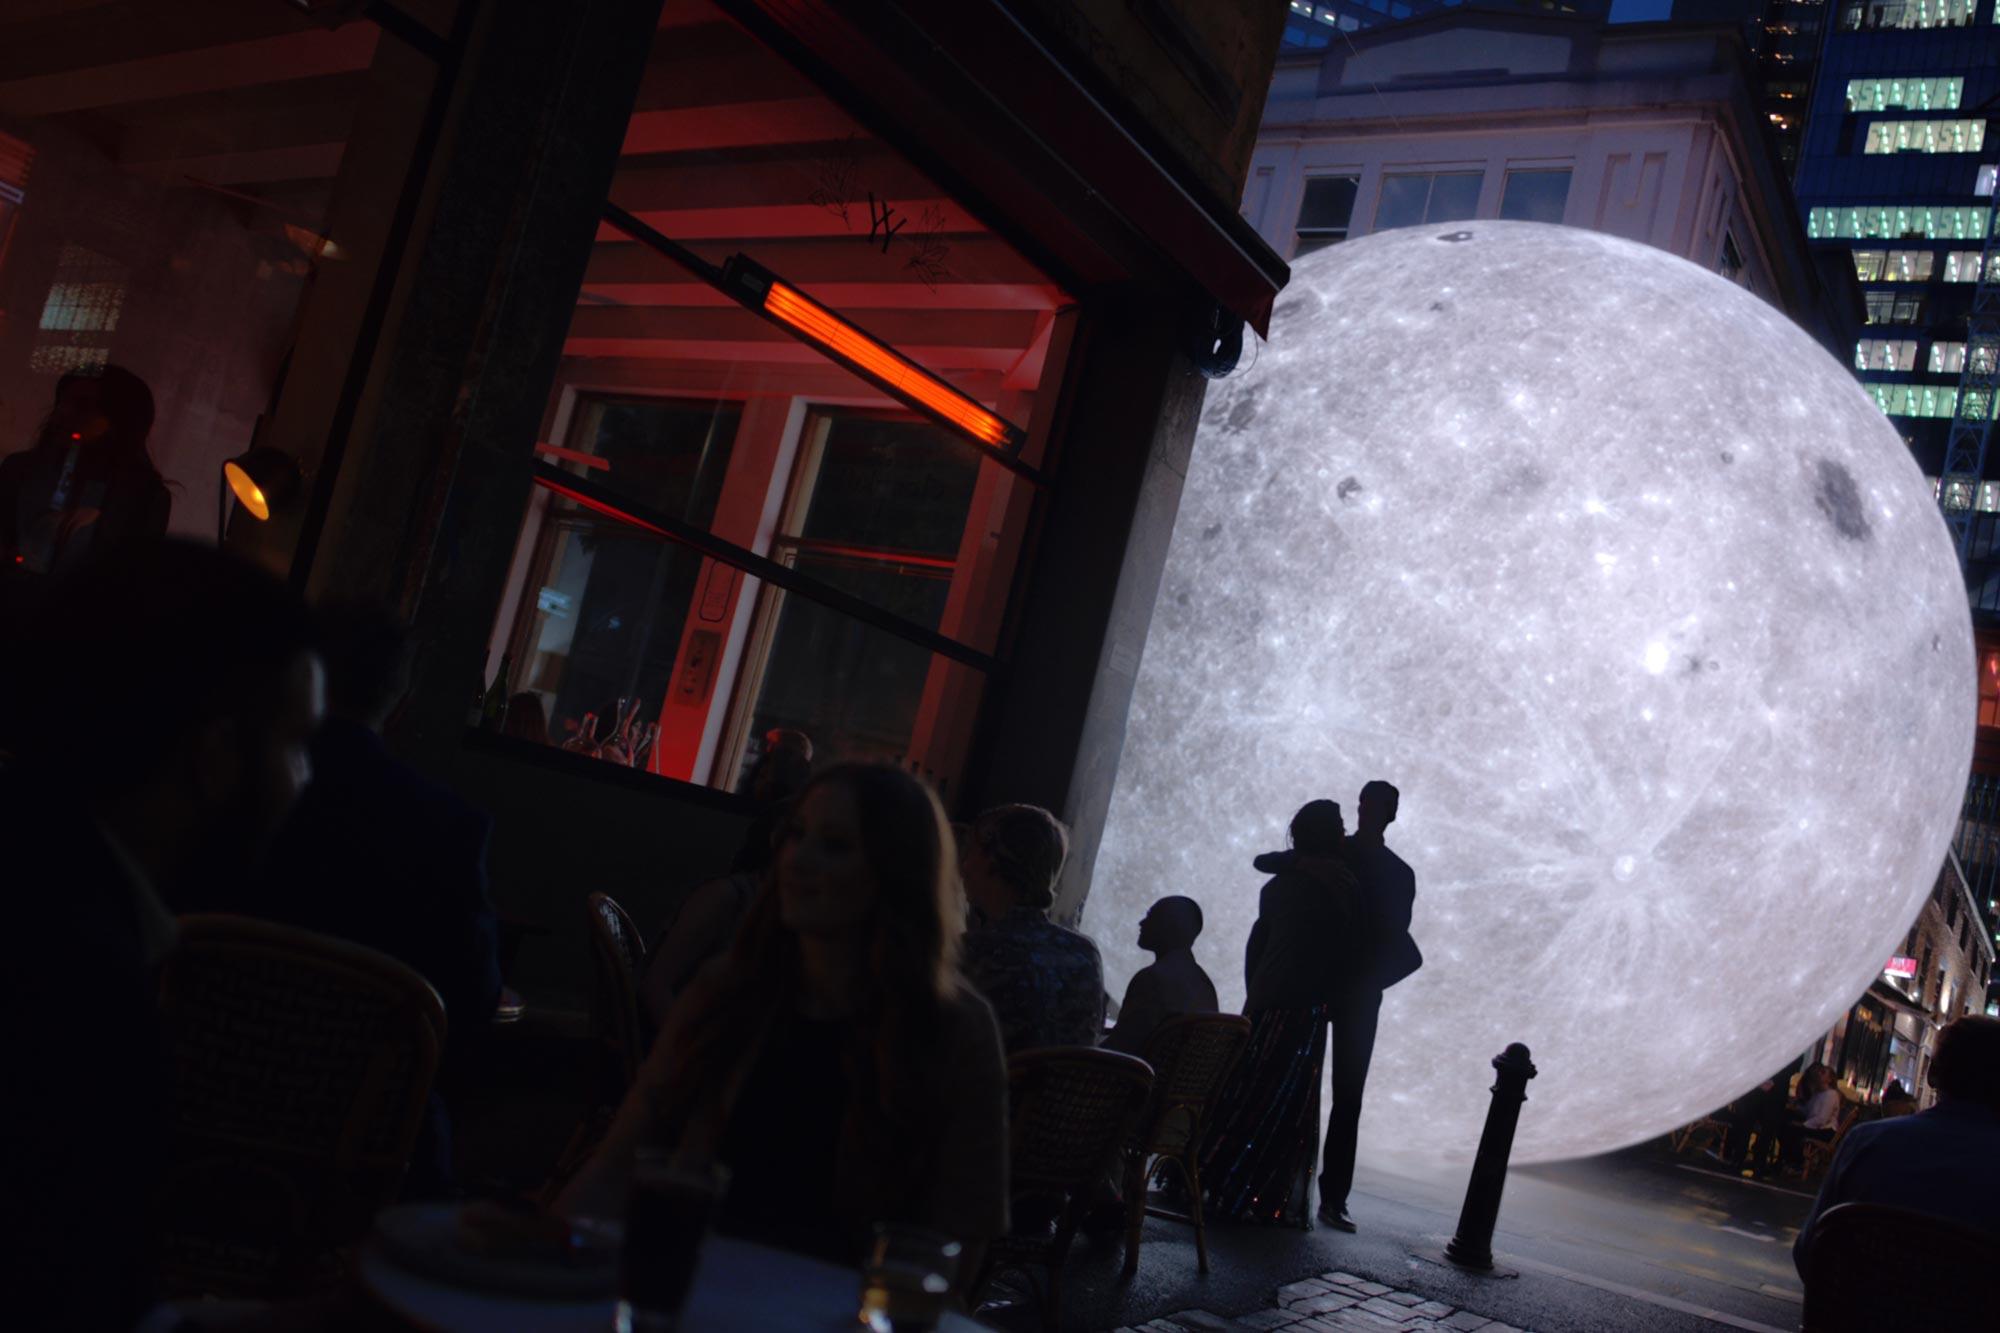 OnePlus: Lunarland